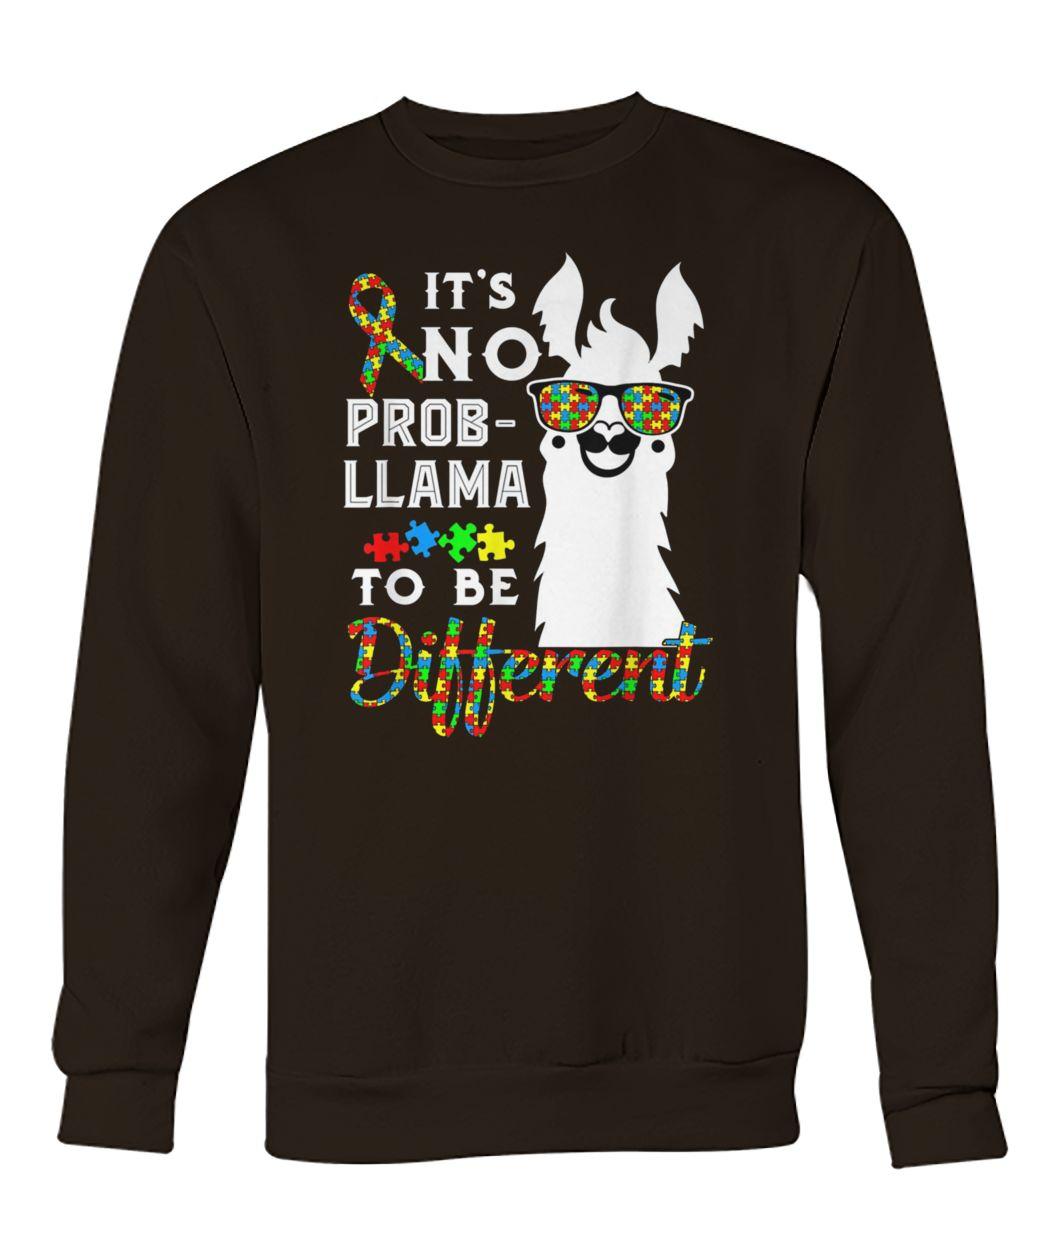 Autism awareness it's no prob-llama to be different crew neck sweatshirt